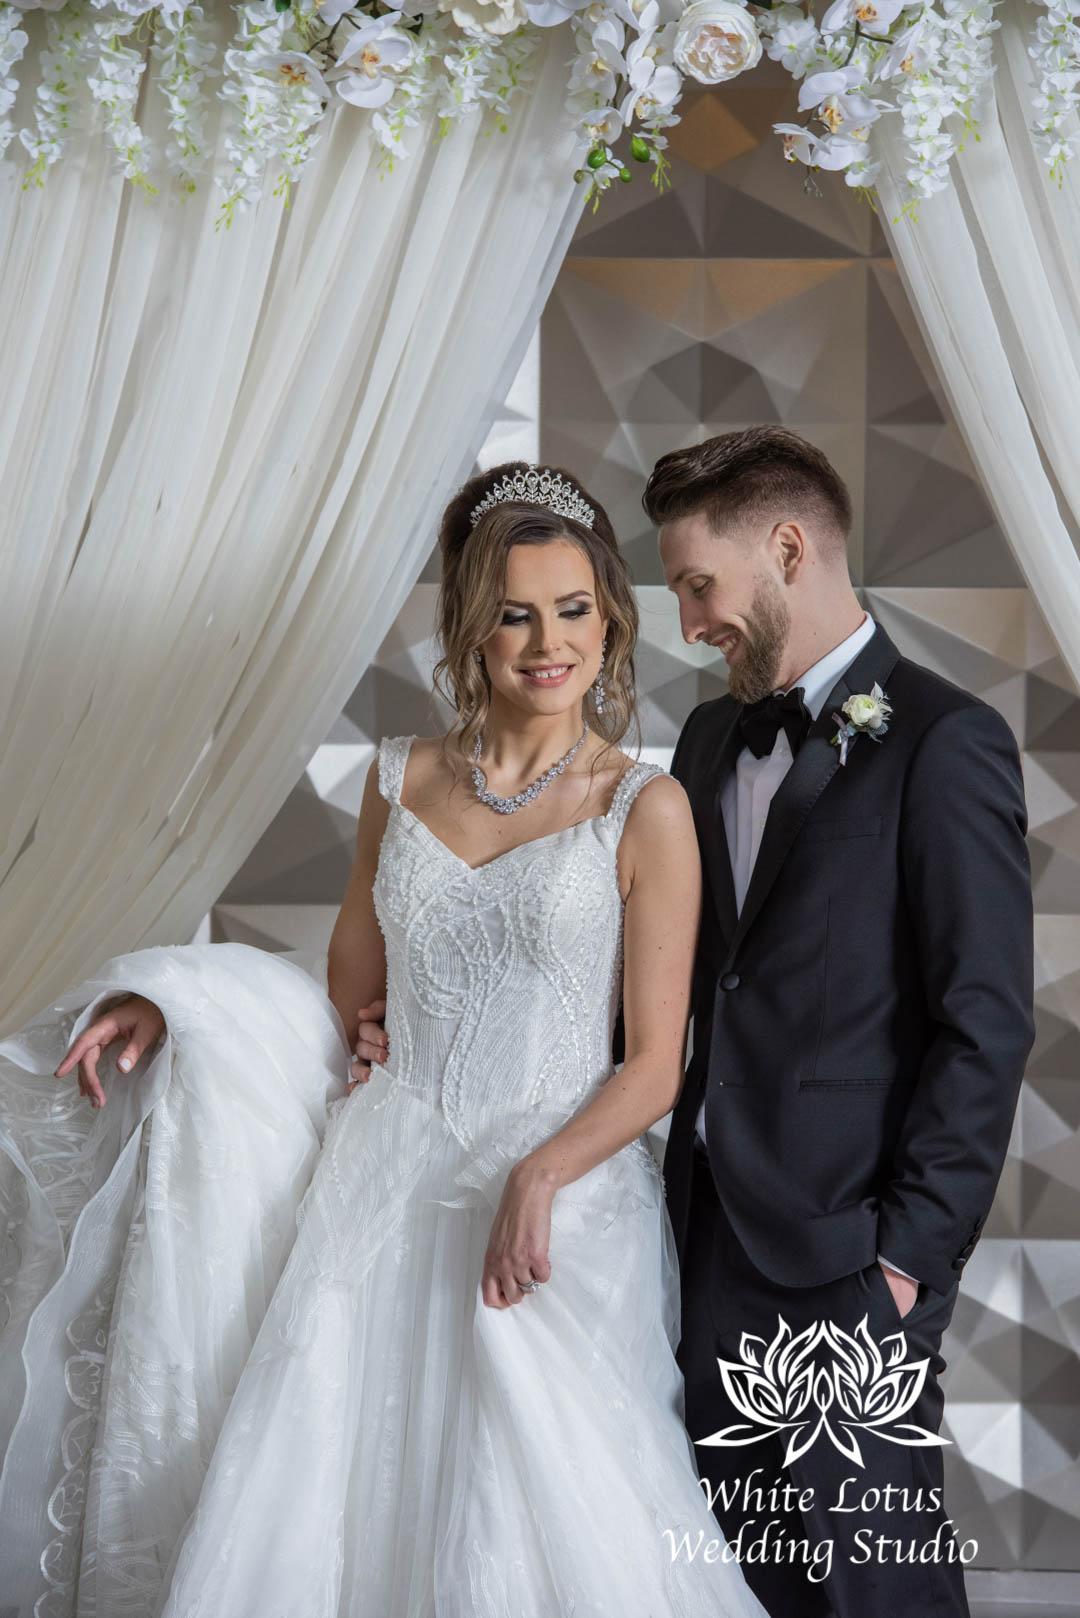 015- GLAM WINTERLUXE WEDDING INSPIRATION